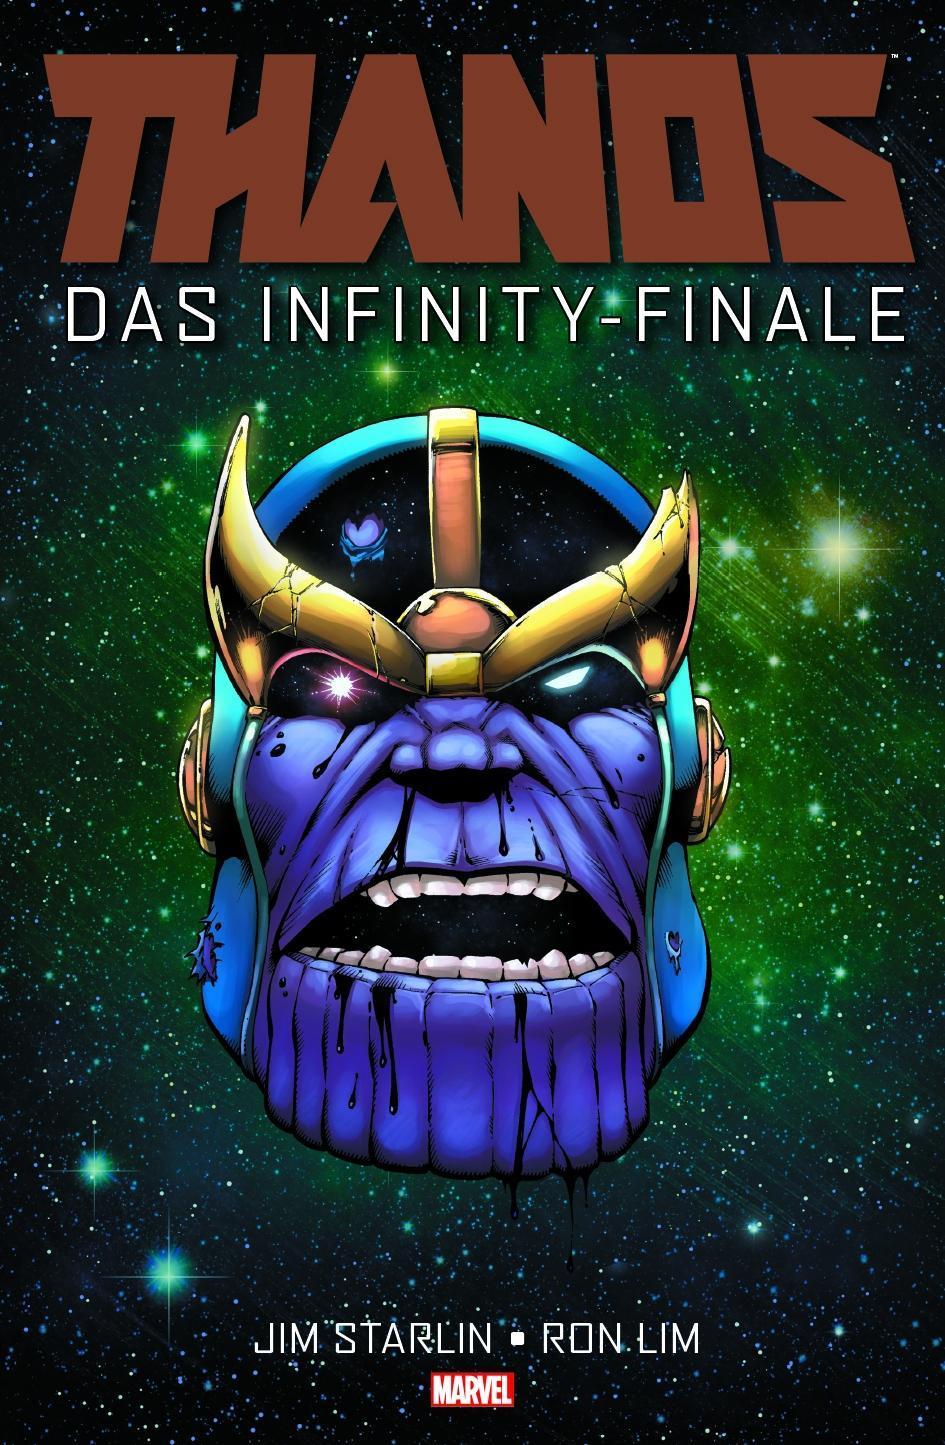 Jim-Starlin-Thanos-Infinity-Finale-9783741601217